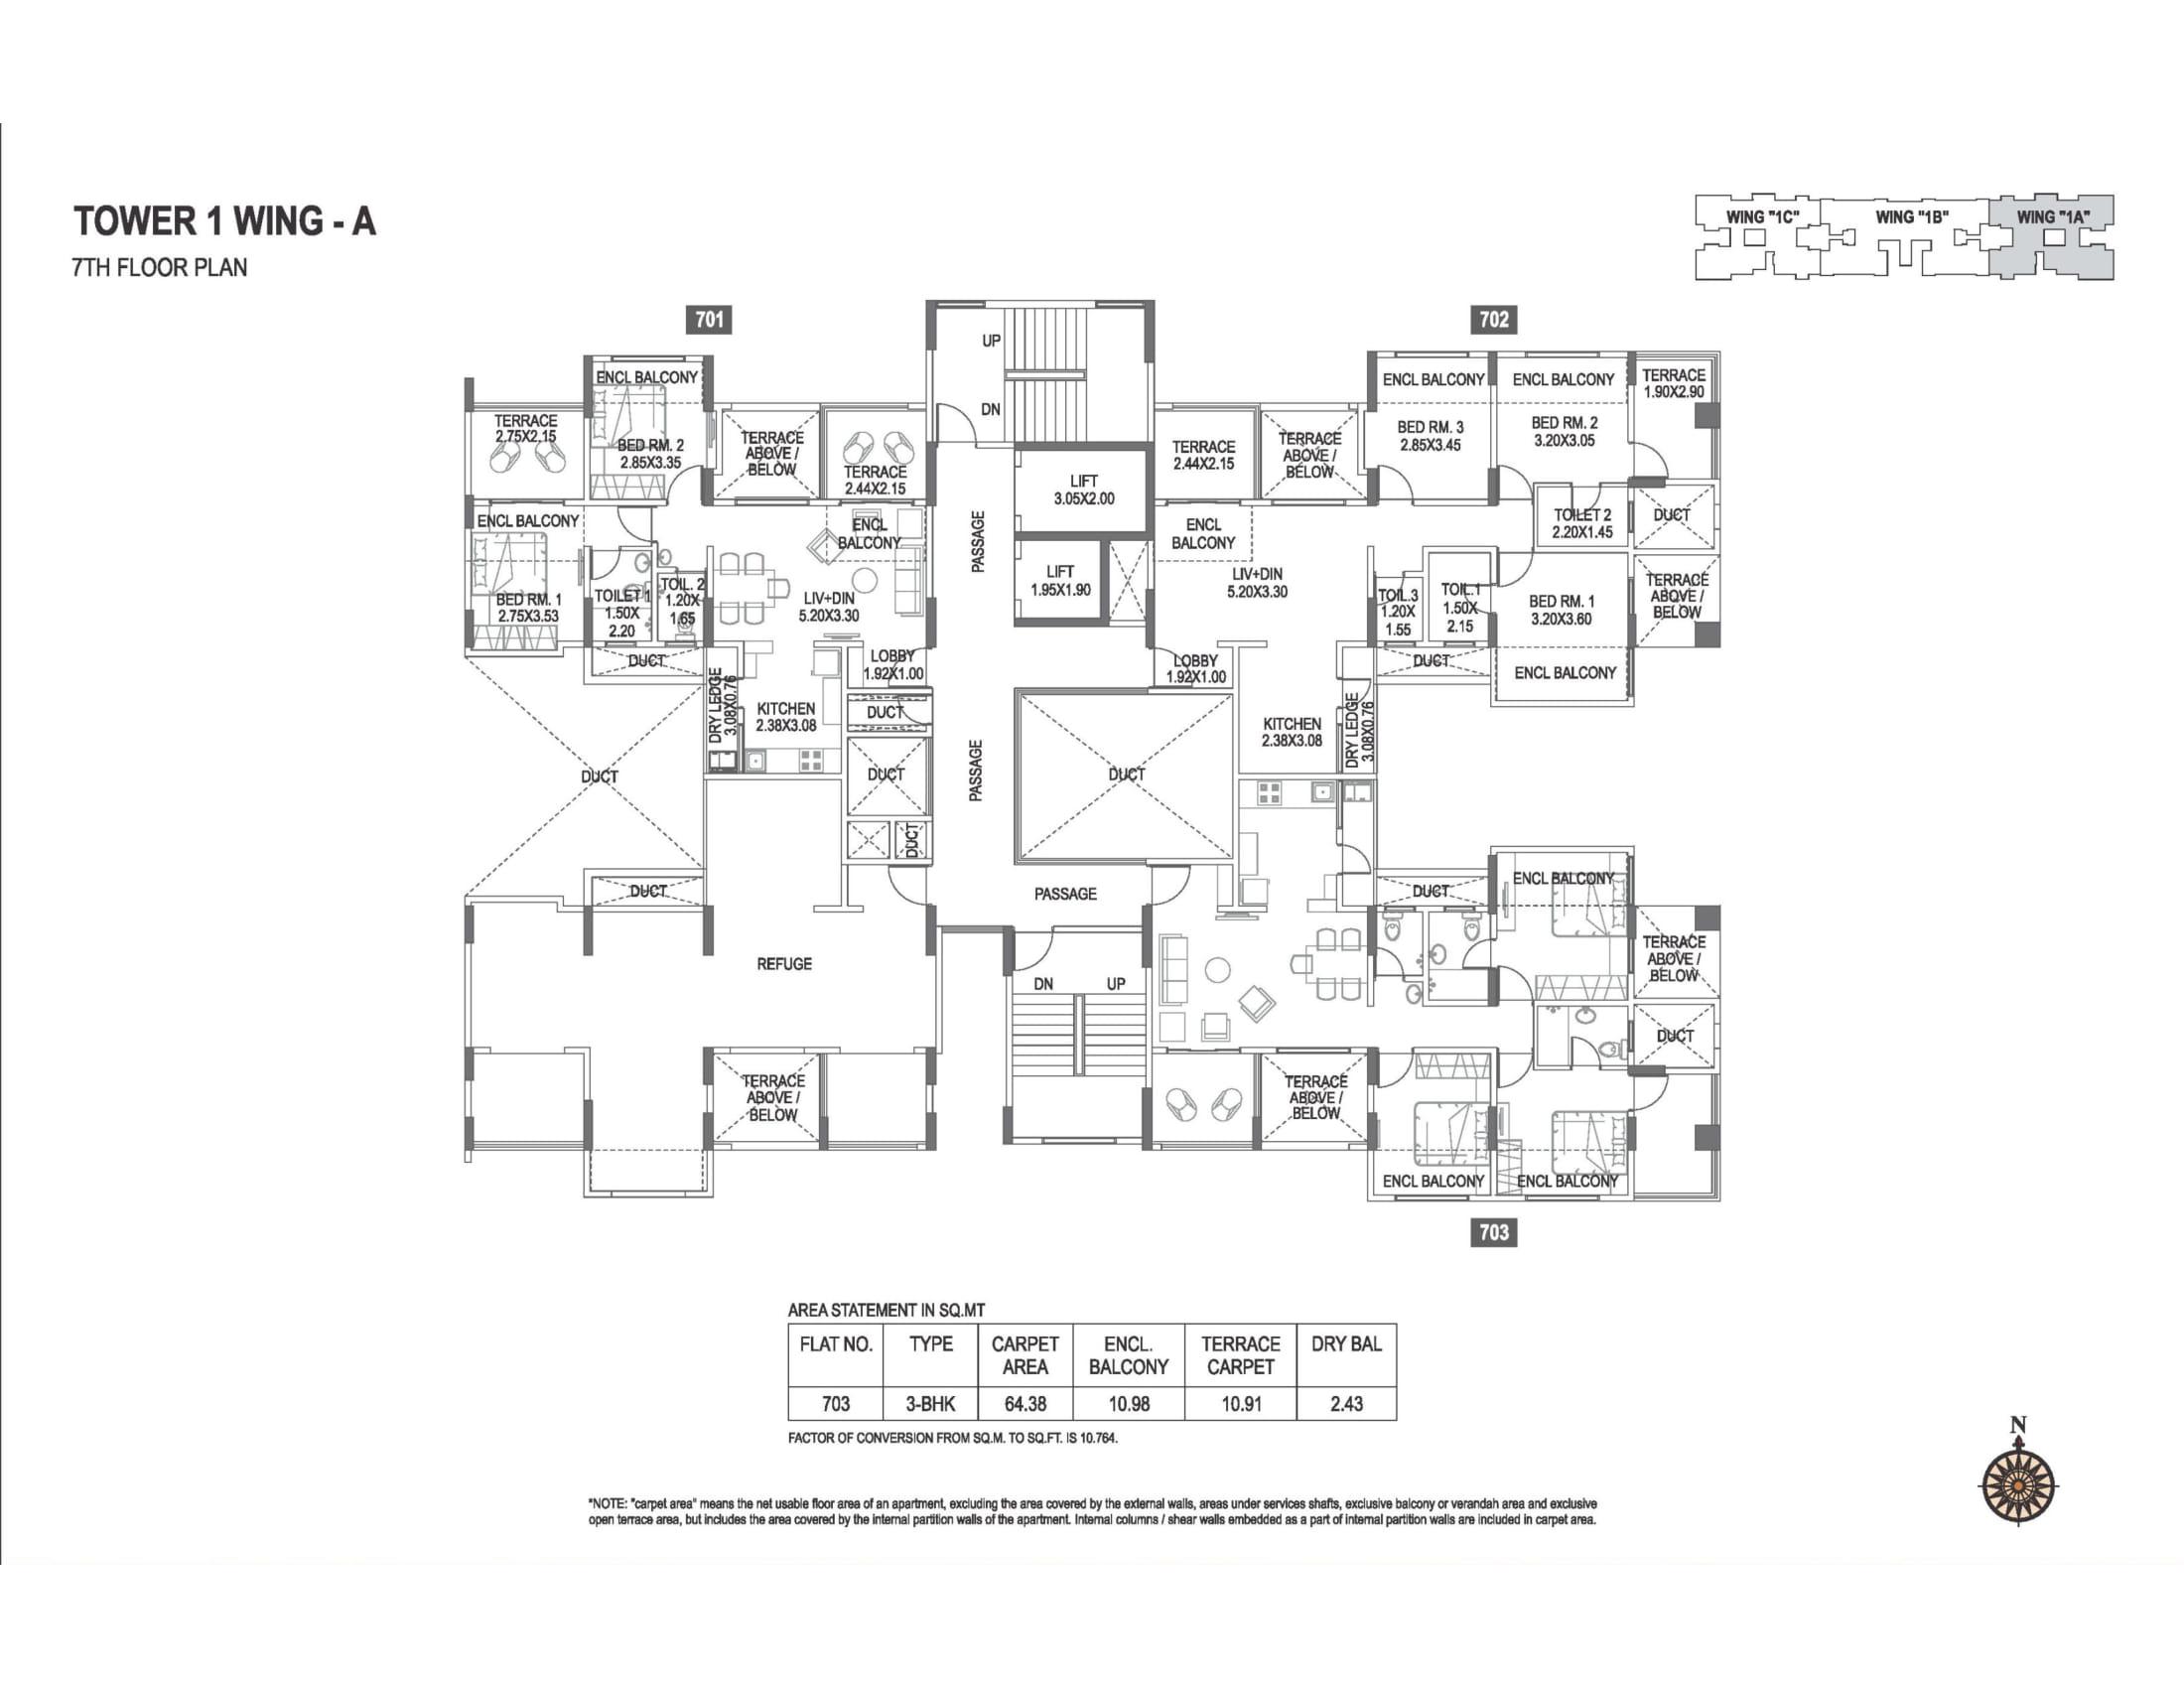 abhiruchi-parisar-tower-1-wing-a-7th-floor-plan-1